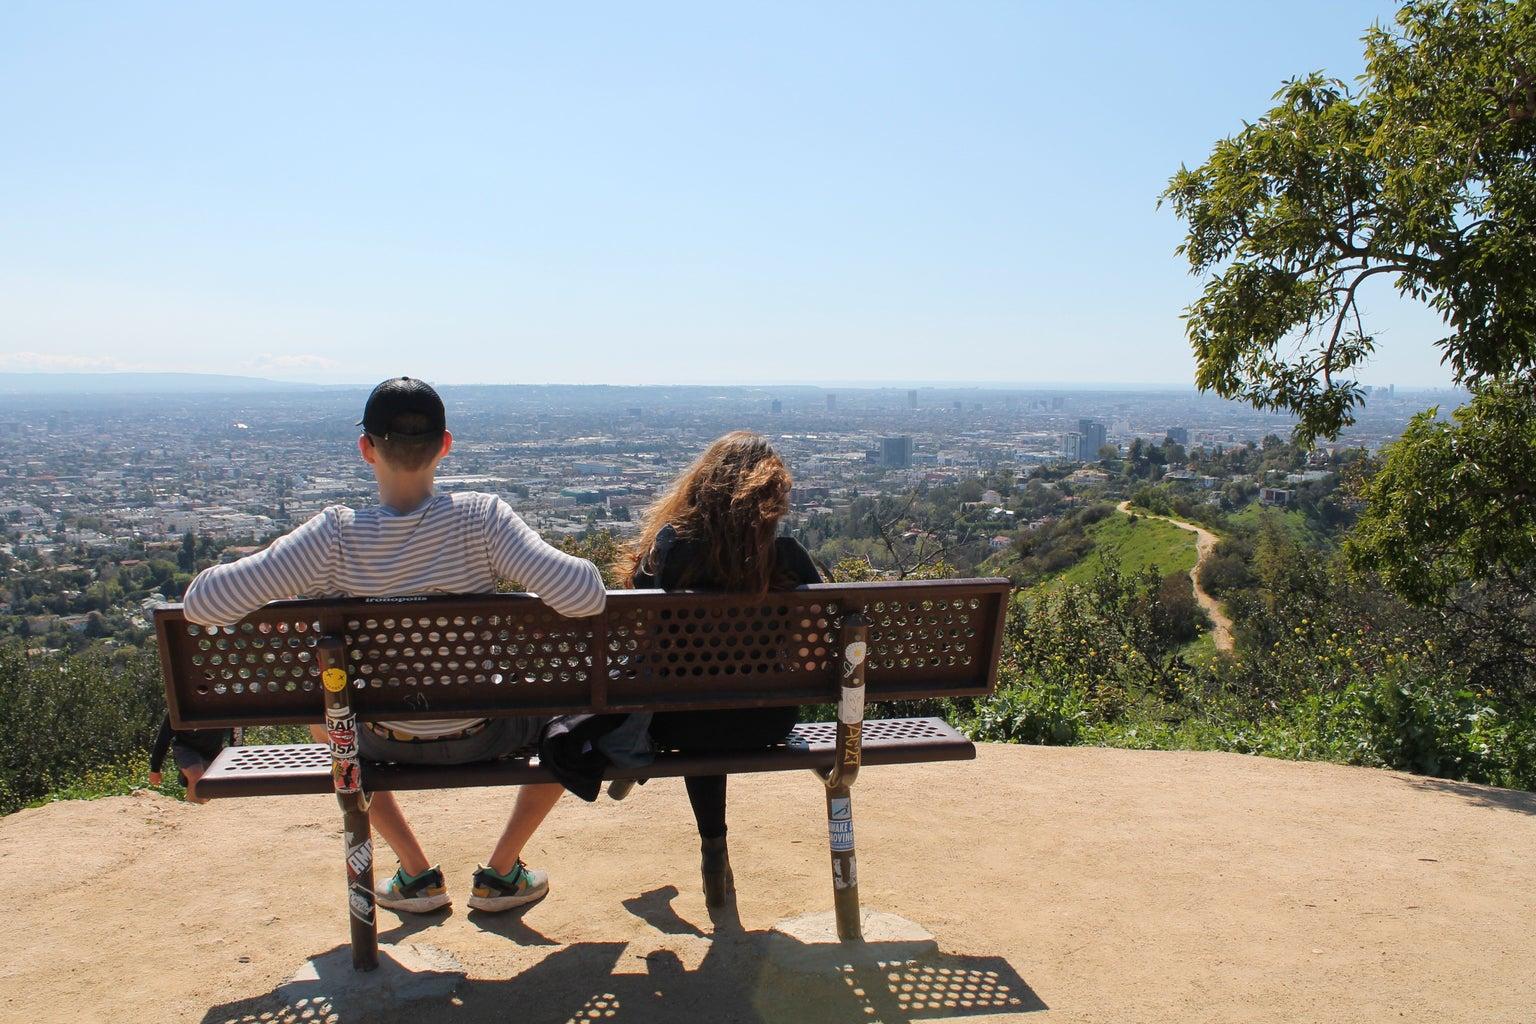 Couple Bench View Hiking Summer Fun Relationship Original